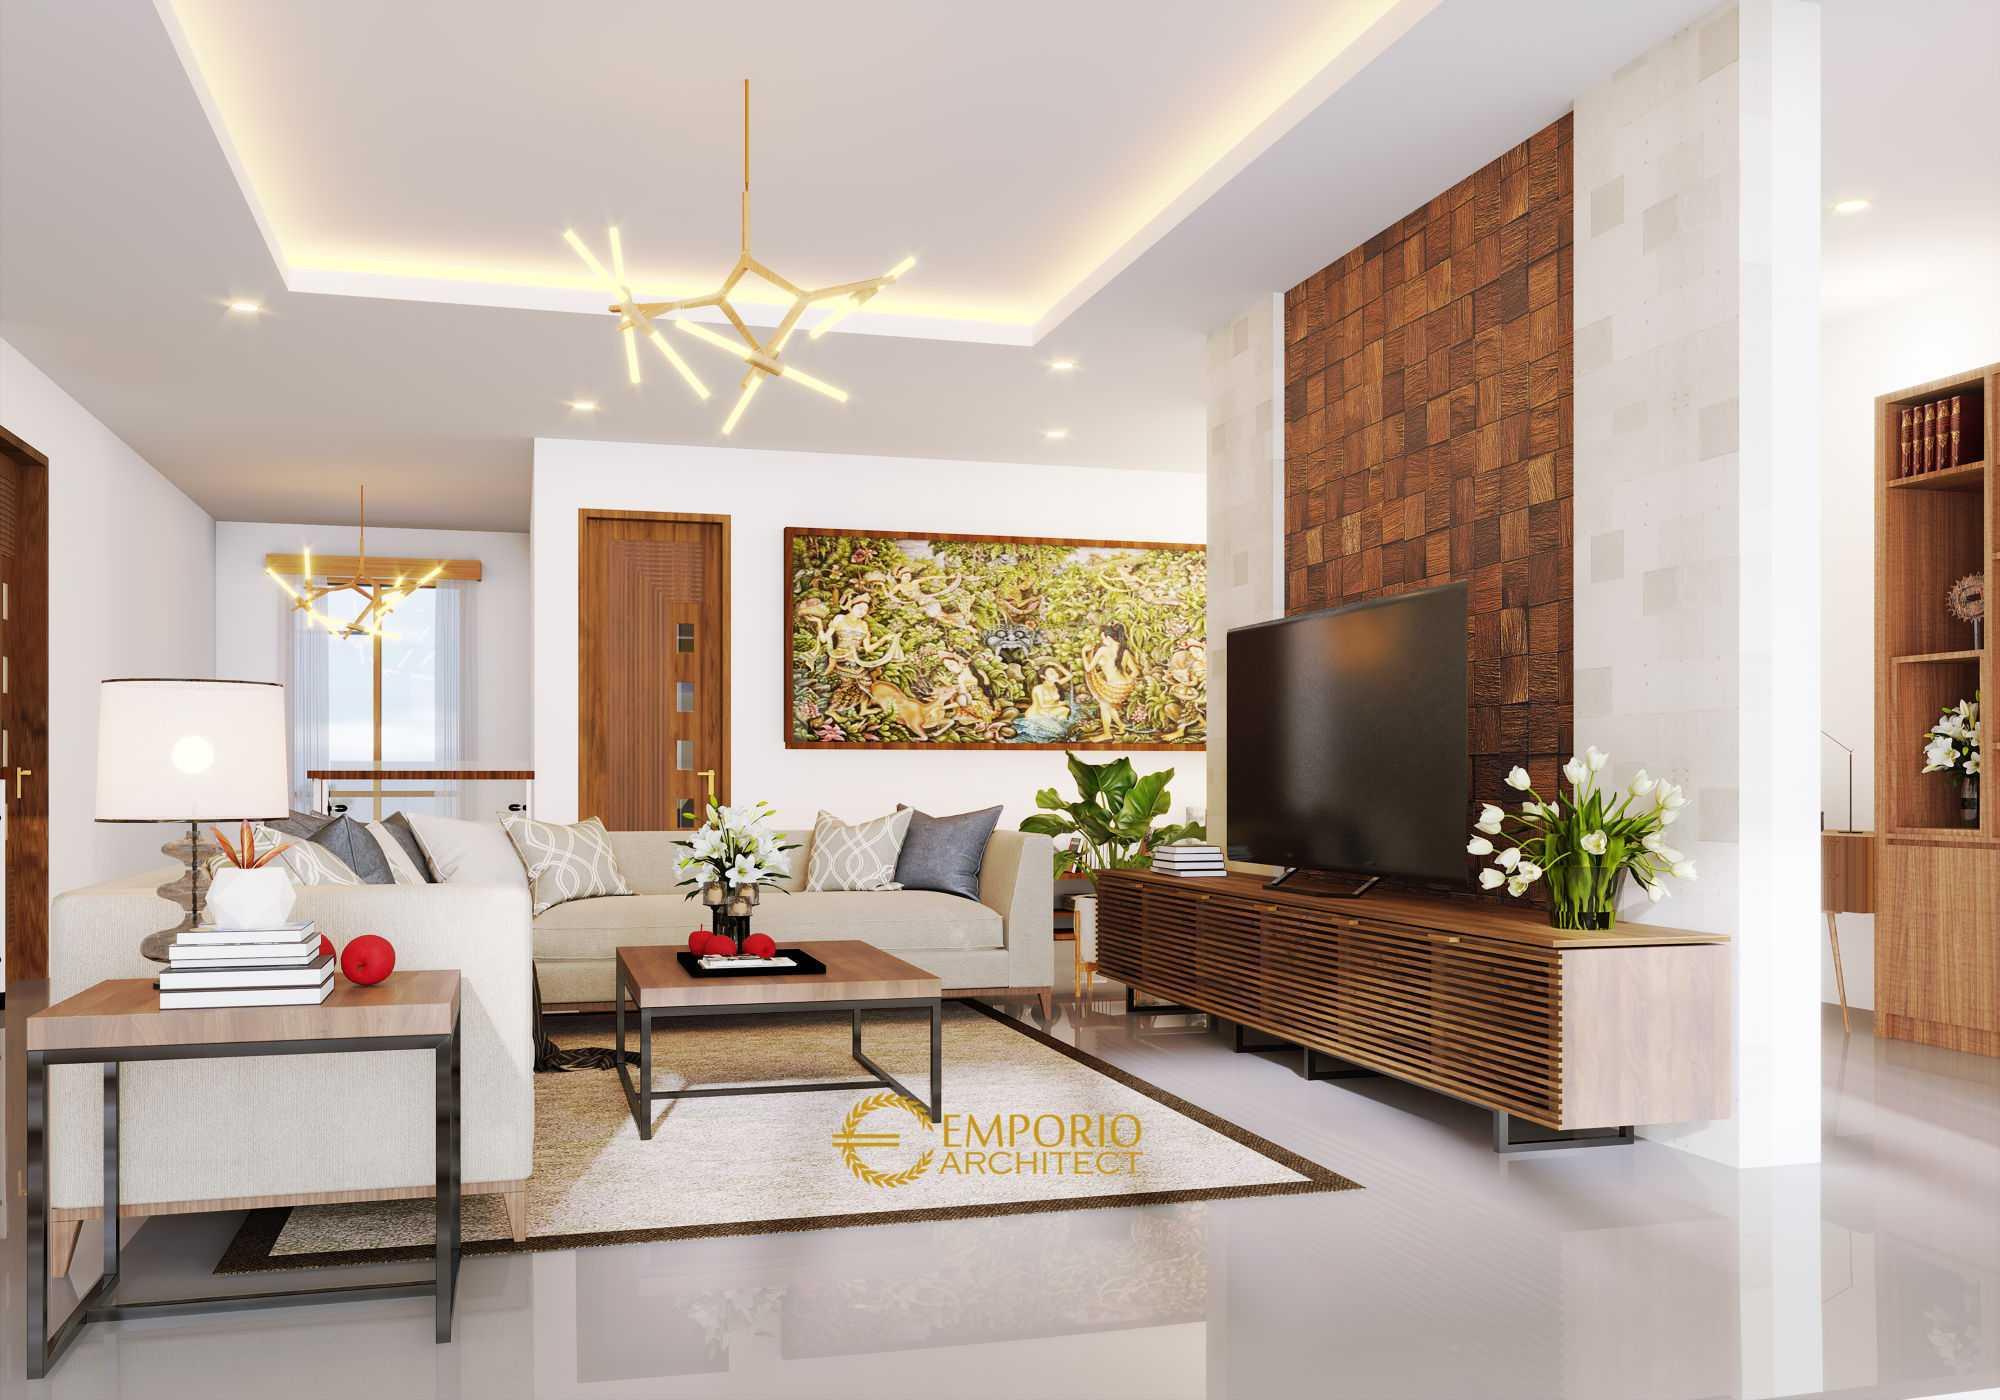 Emporio Architect Jasa Arsitek Makassar Desain Rumah Villa Bali Tropis 683 @ Makassar Makassar, Kota Makassar, Sulawesi Selatan, Indonesia Makassar, Kota Makassar, Sulawesi Selatan, Indonesia Emporio-Architect-Jasa-Arsitek-Makassar-Desain-Rumah-Villa-Bali-Tropis-683-Makassar  81777